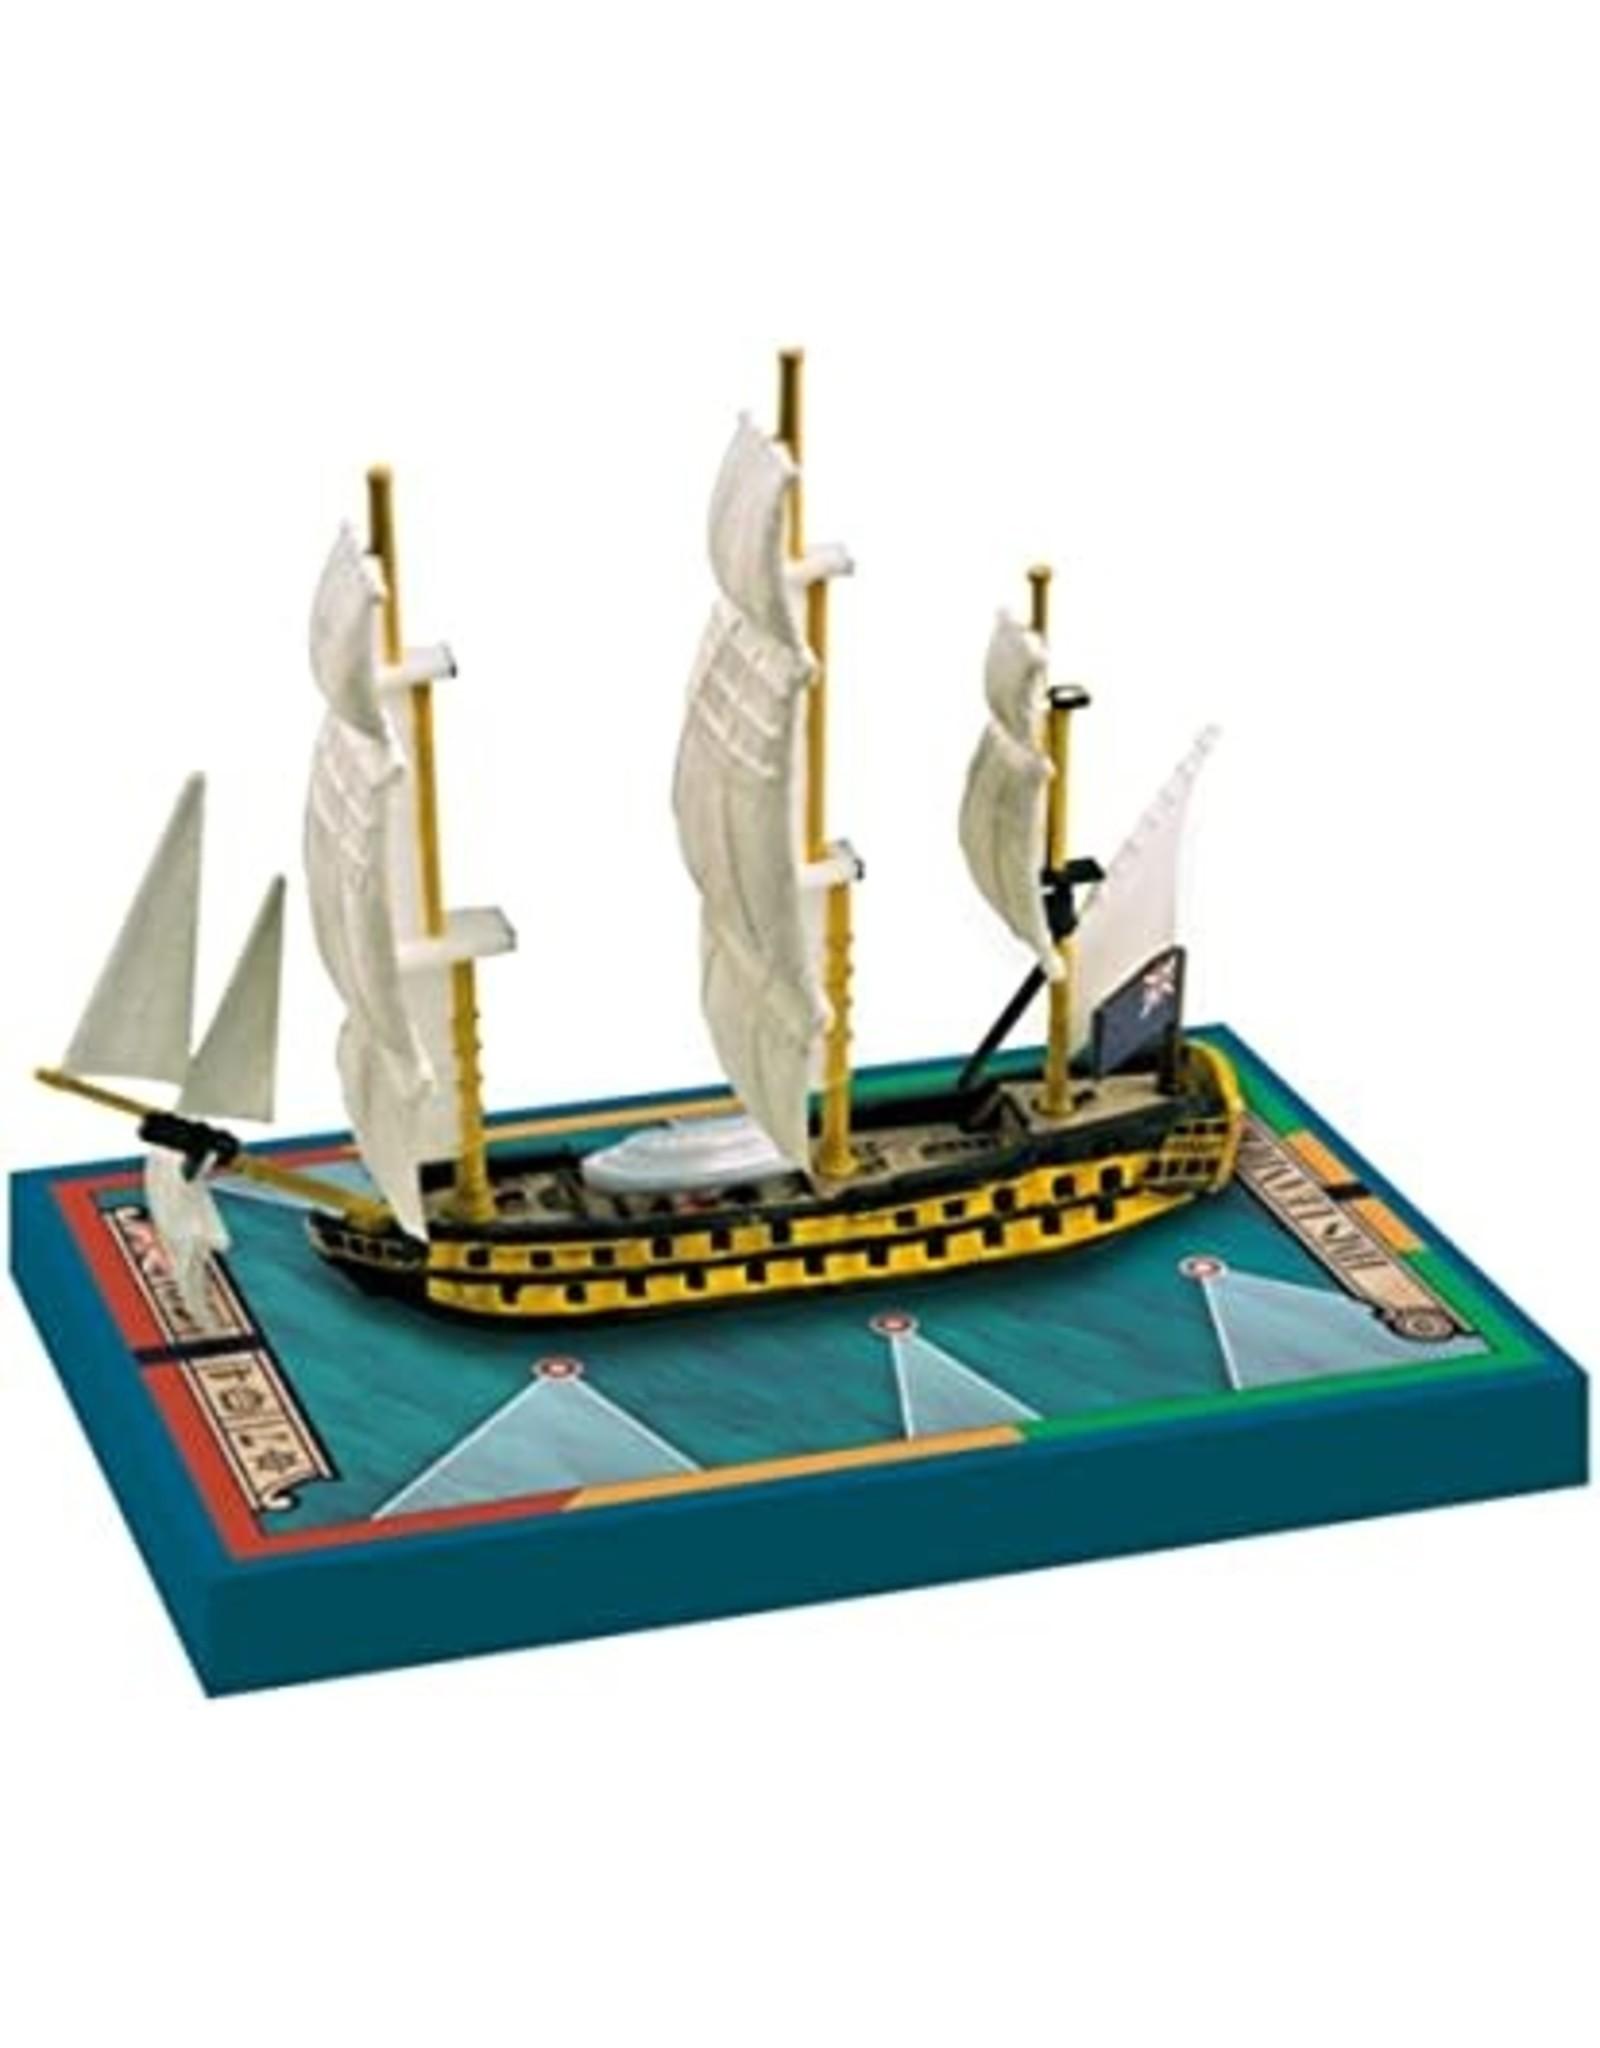 ARES GAMES SAILS OF GLORY HMS LEANDER 1780 HMS ADAMANT 1780 SHIP PACK